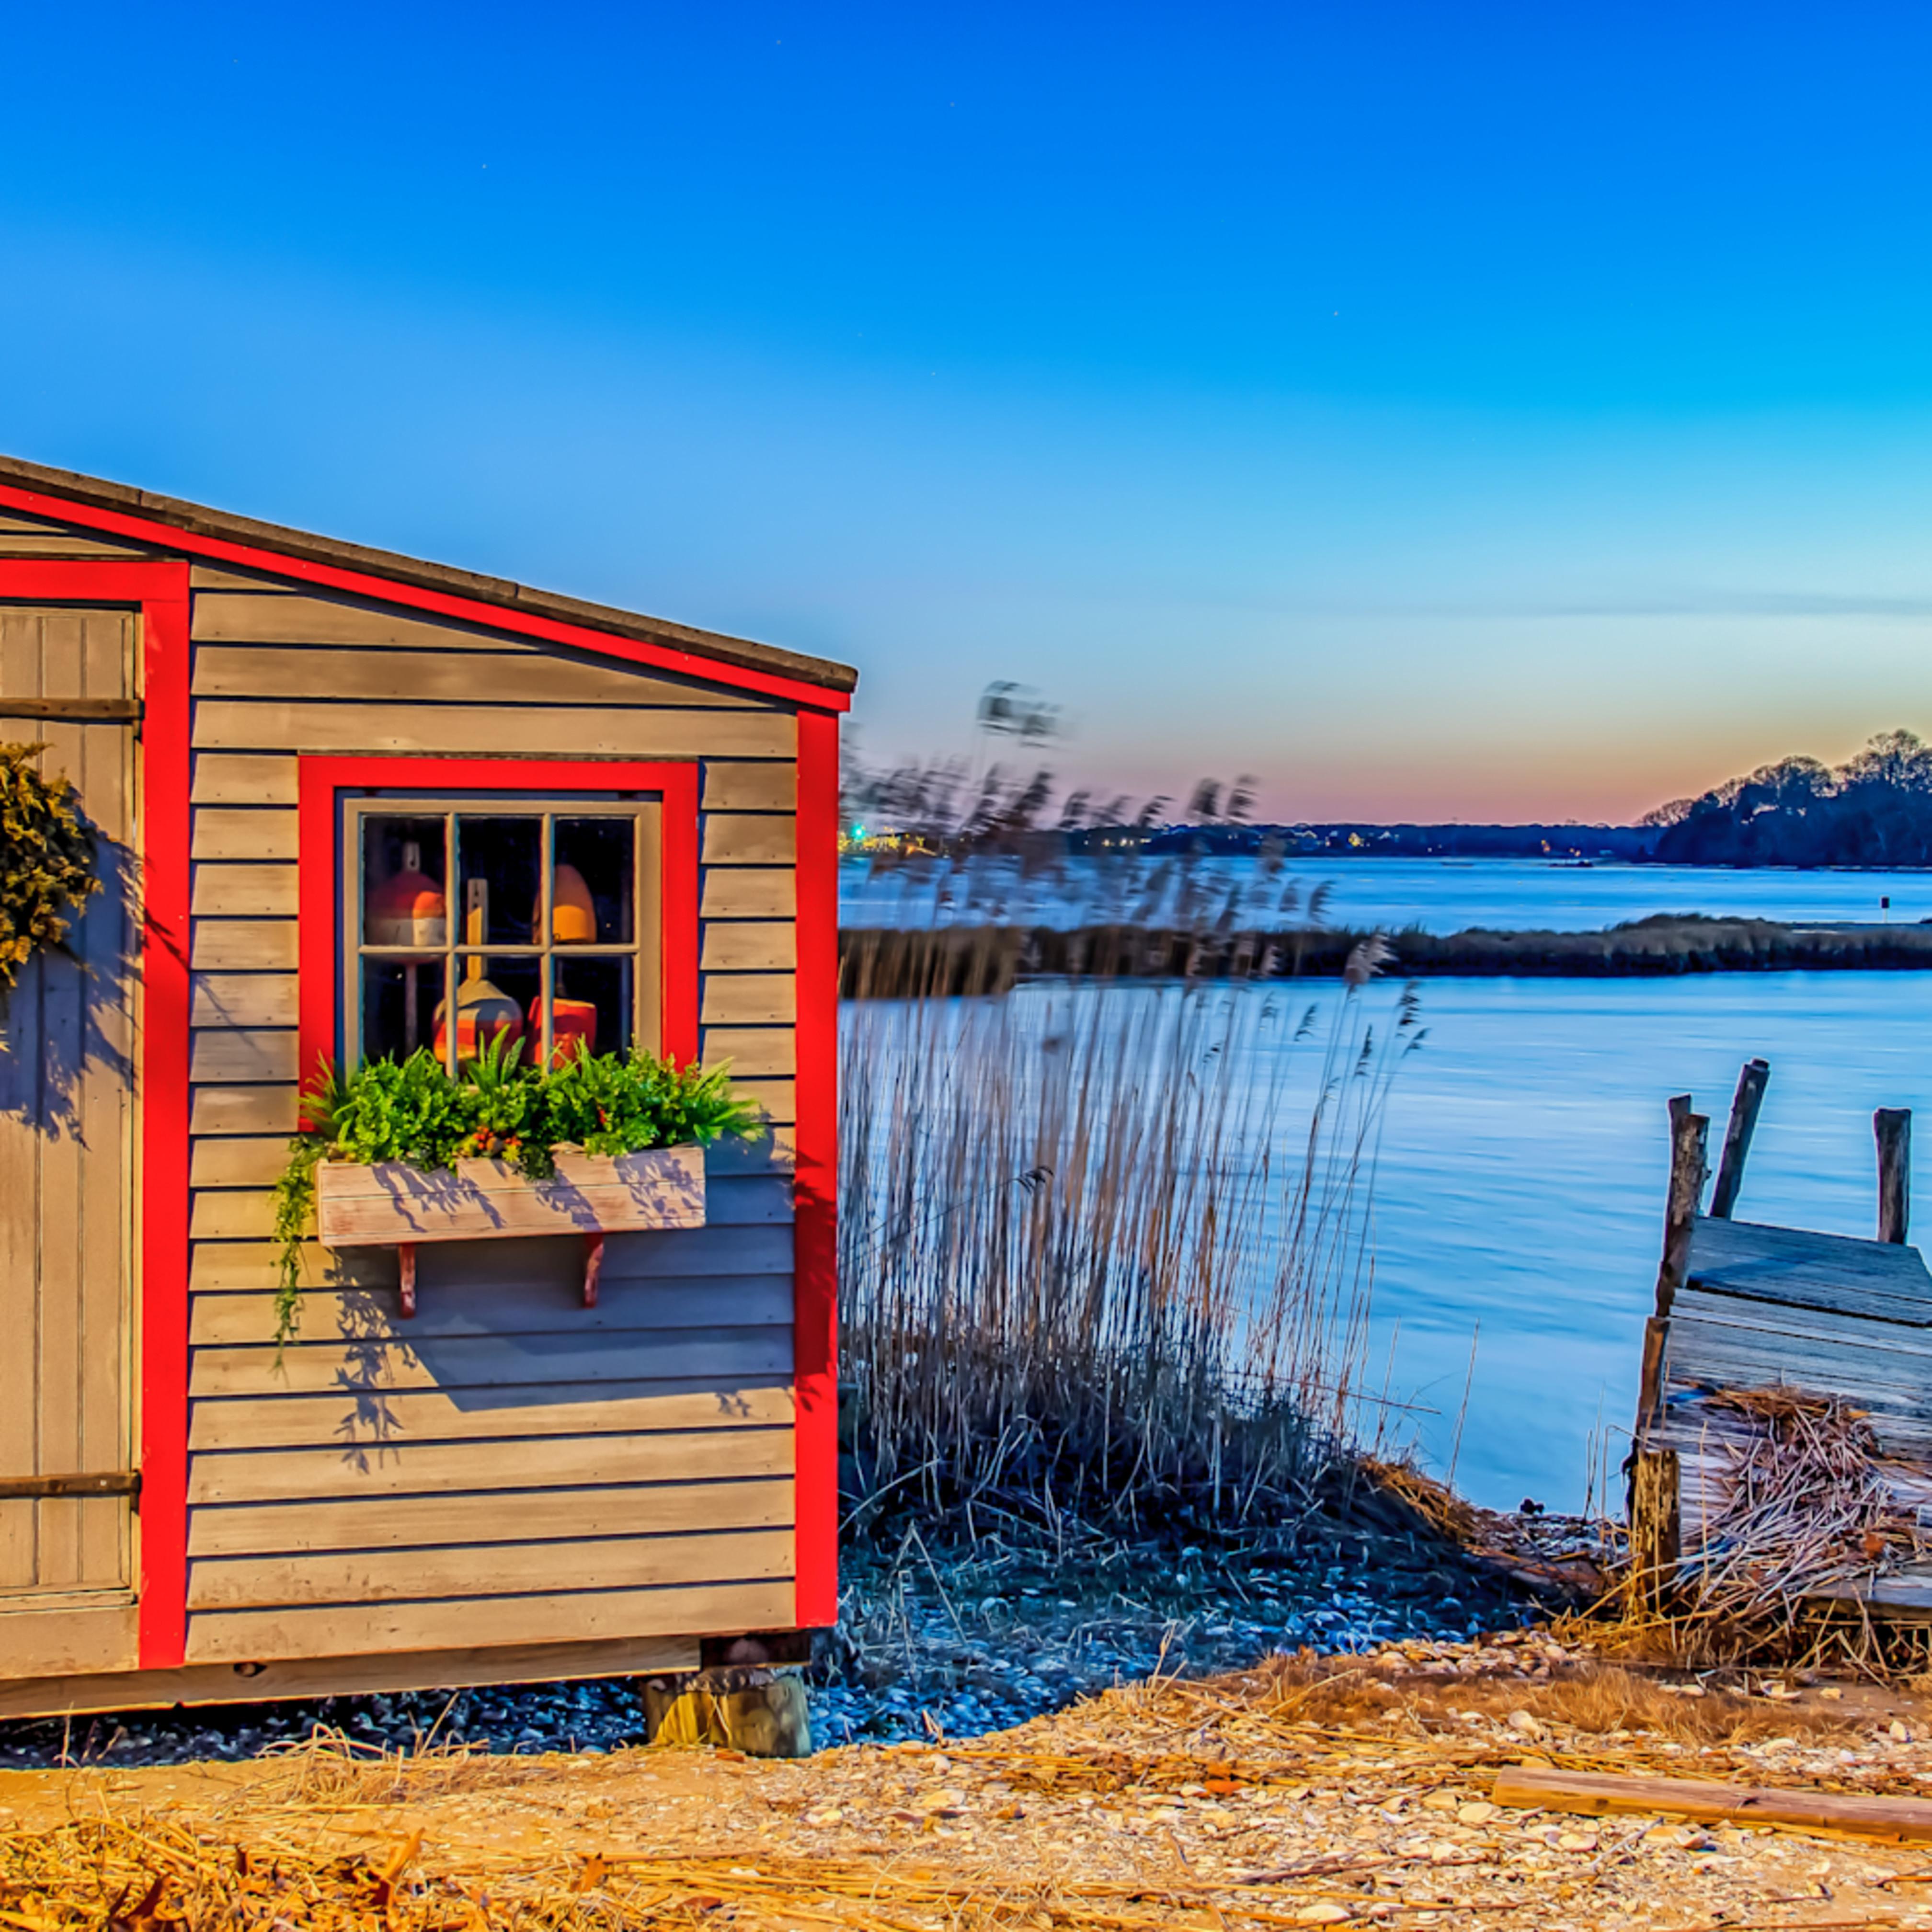 lagoon pond new year s sunrise 2021 1 kbt0jk